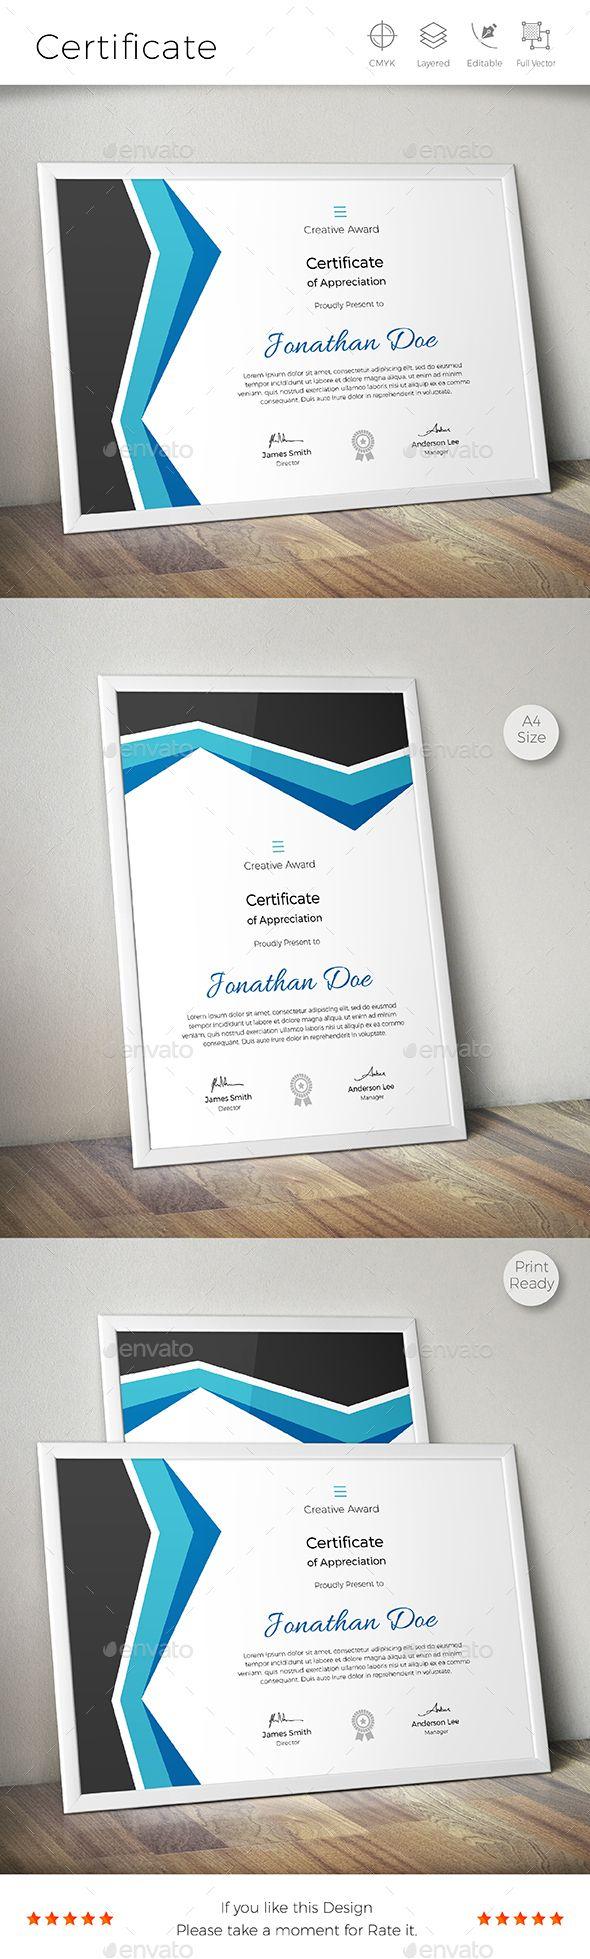 18 best сертификат images on Pinterest | Certificate templates ...